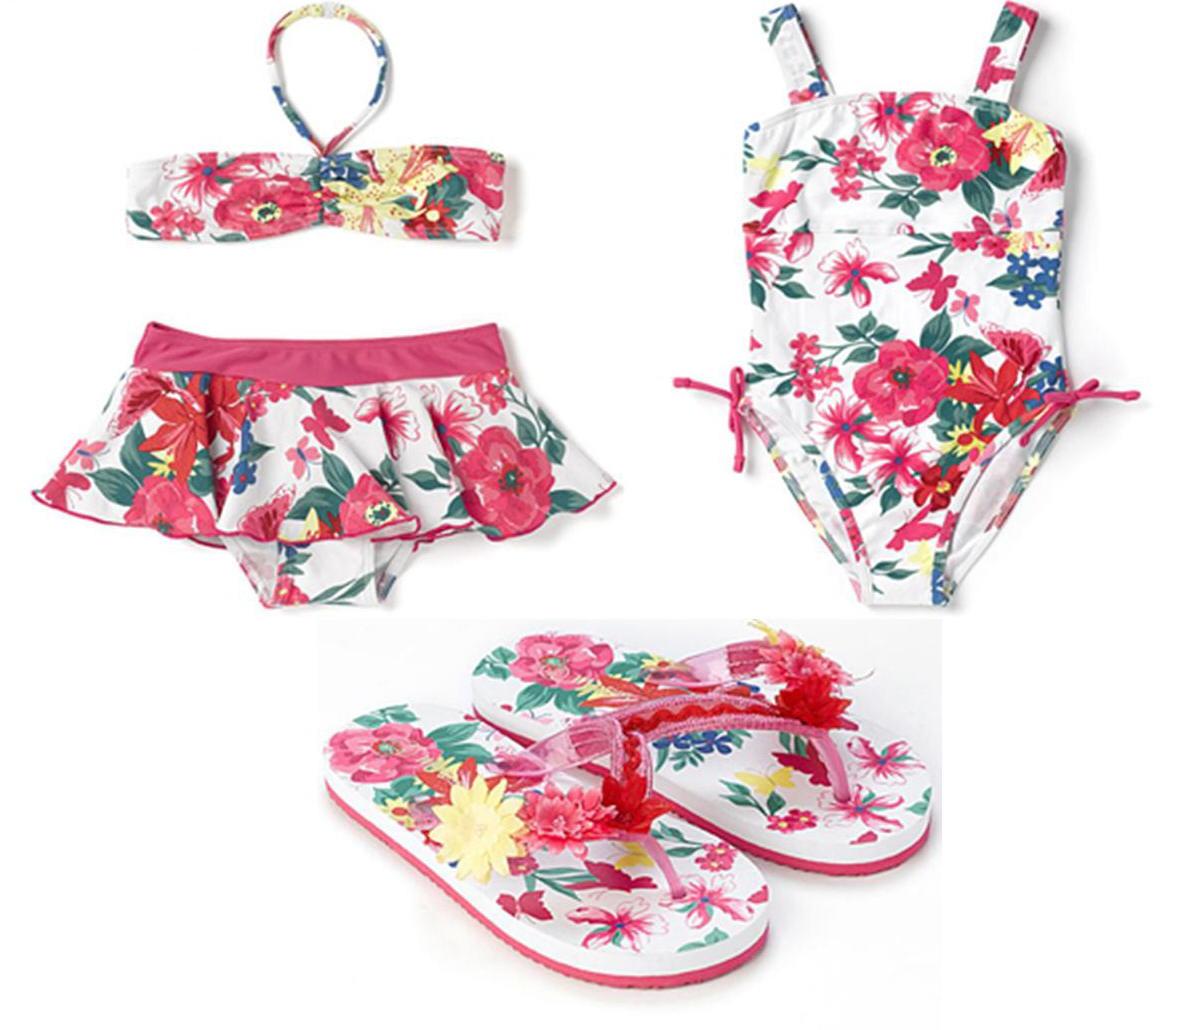 Imagenes De Trajes De Baño Para Nina:Lenceria y trajes de baño: Ropa de playa para niña de Monsoon